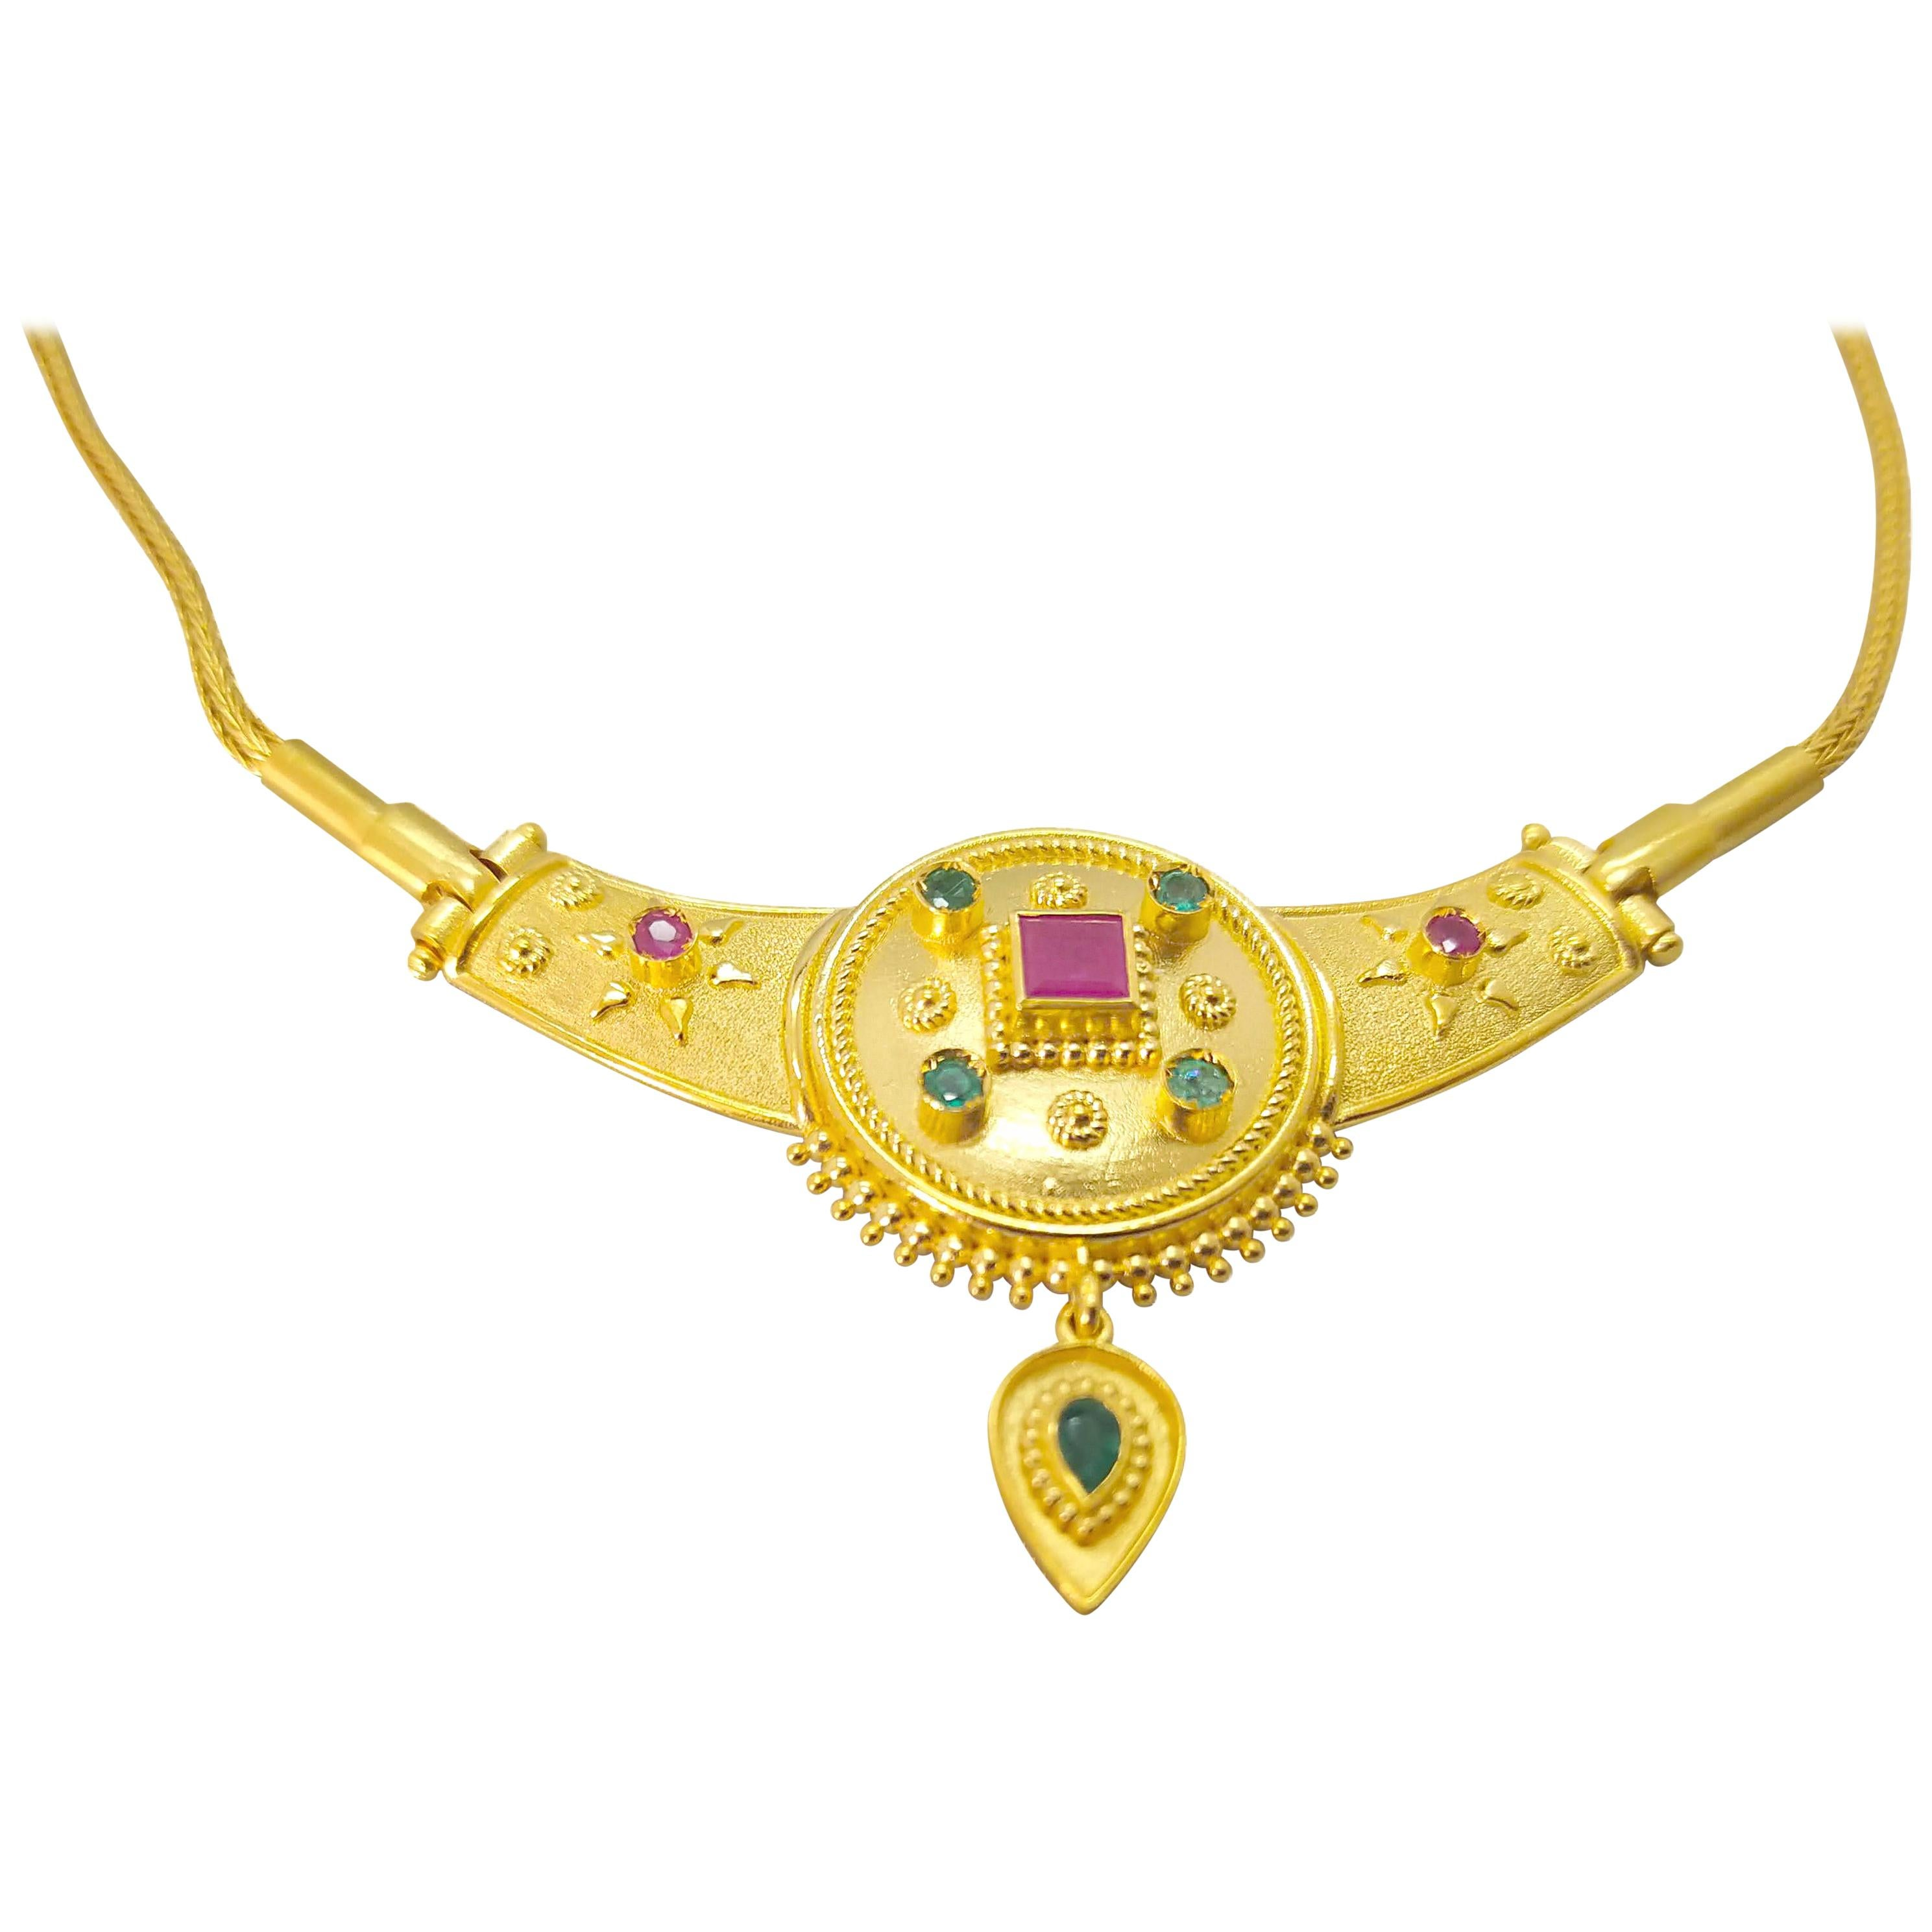 Georgios Collections 18 Karat Yellow Gold Ruby Emerald Drop Pendant Necklace